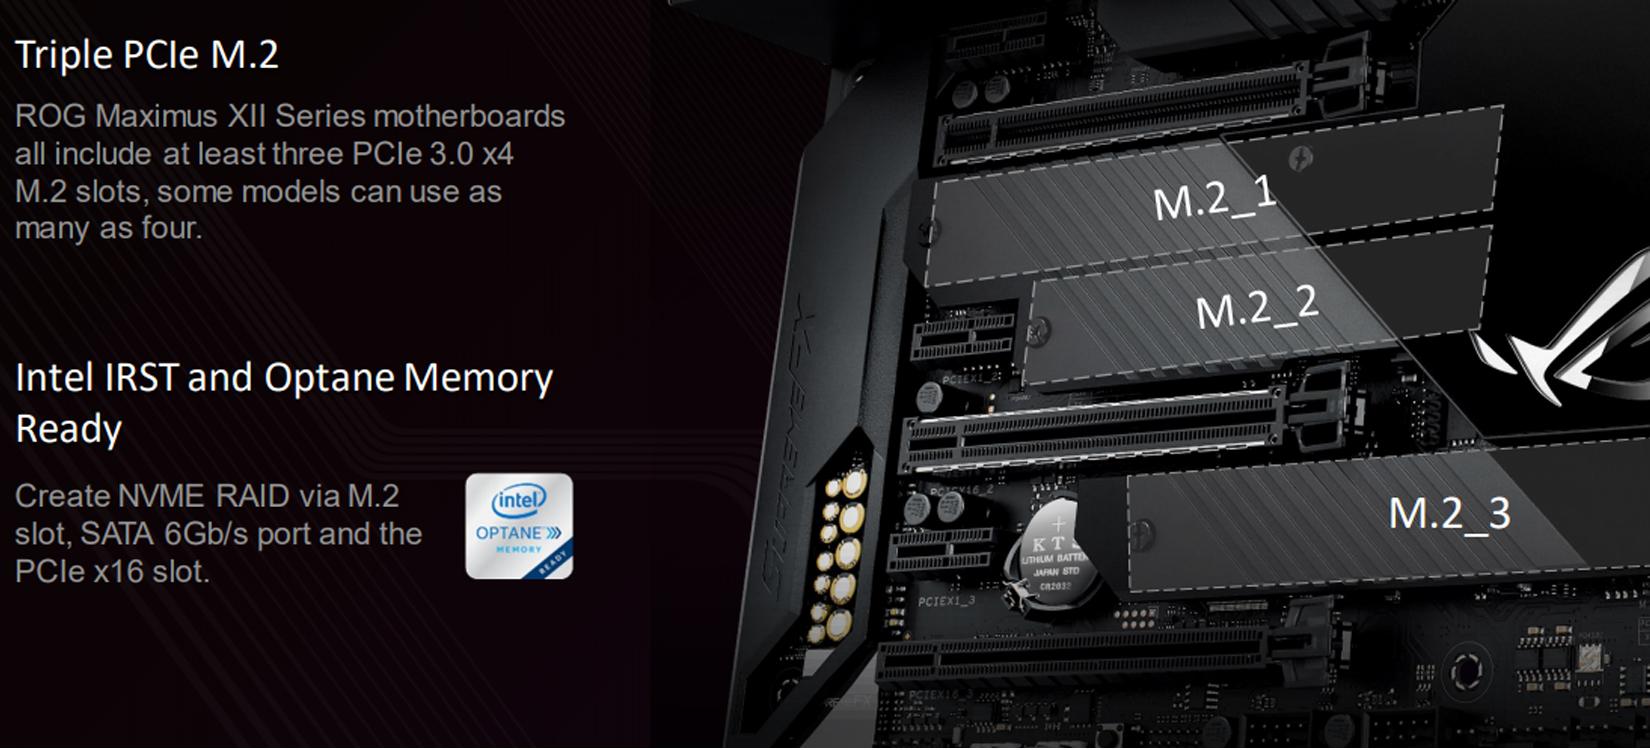 Mainboard ASUS ROG MAXIMUS XII APEX (Intel Z490, Socket 1200, ATX, 4 khe RAM DDR4)